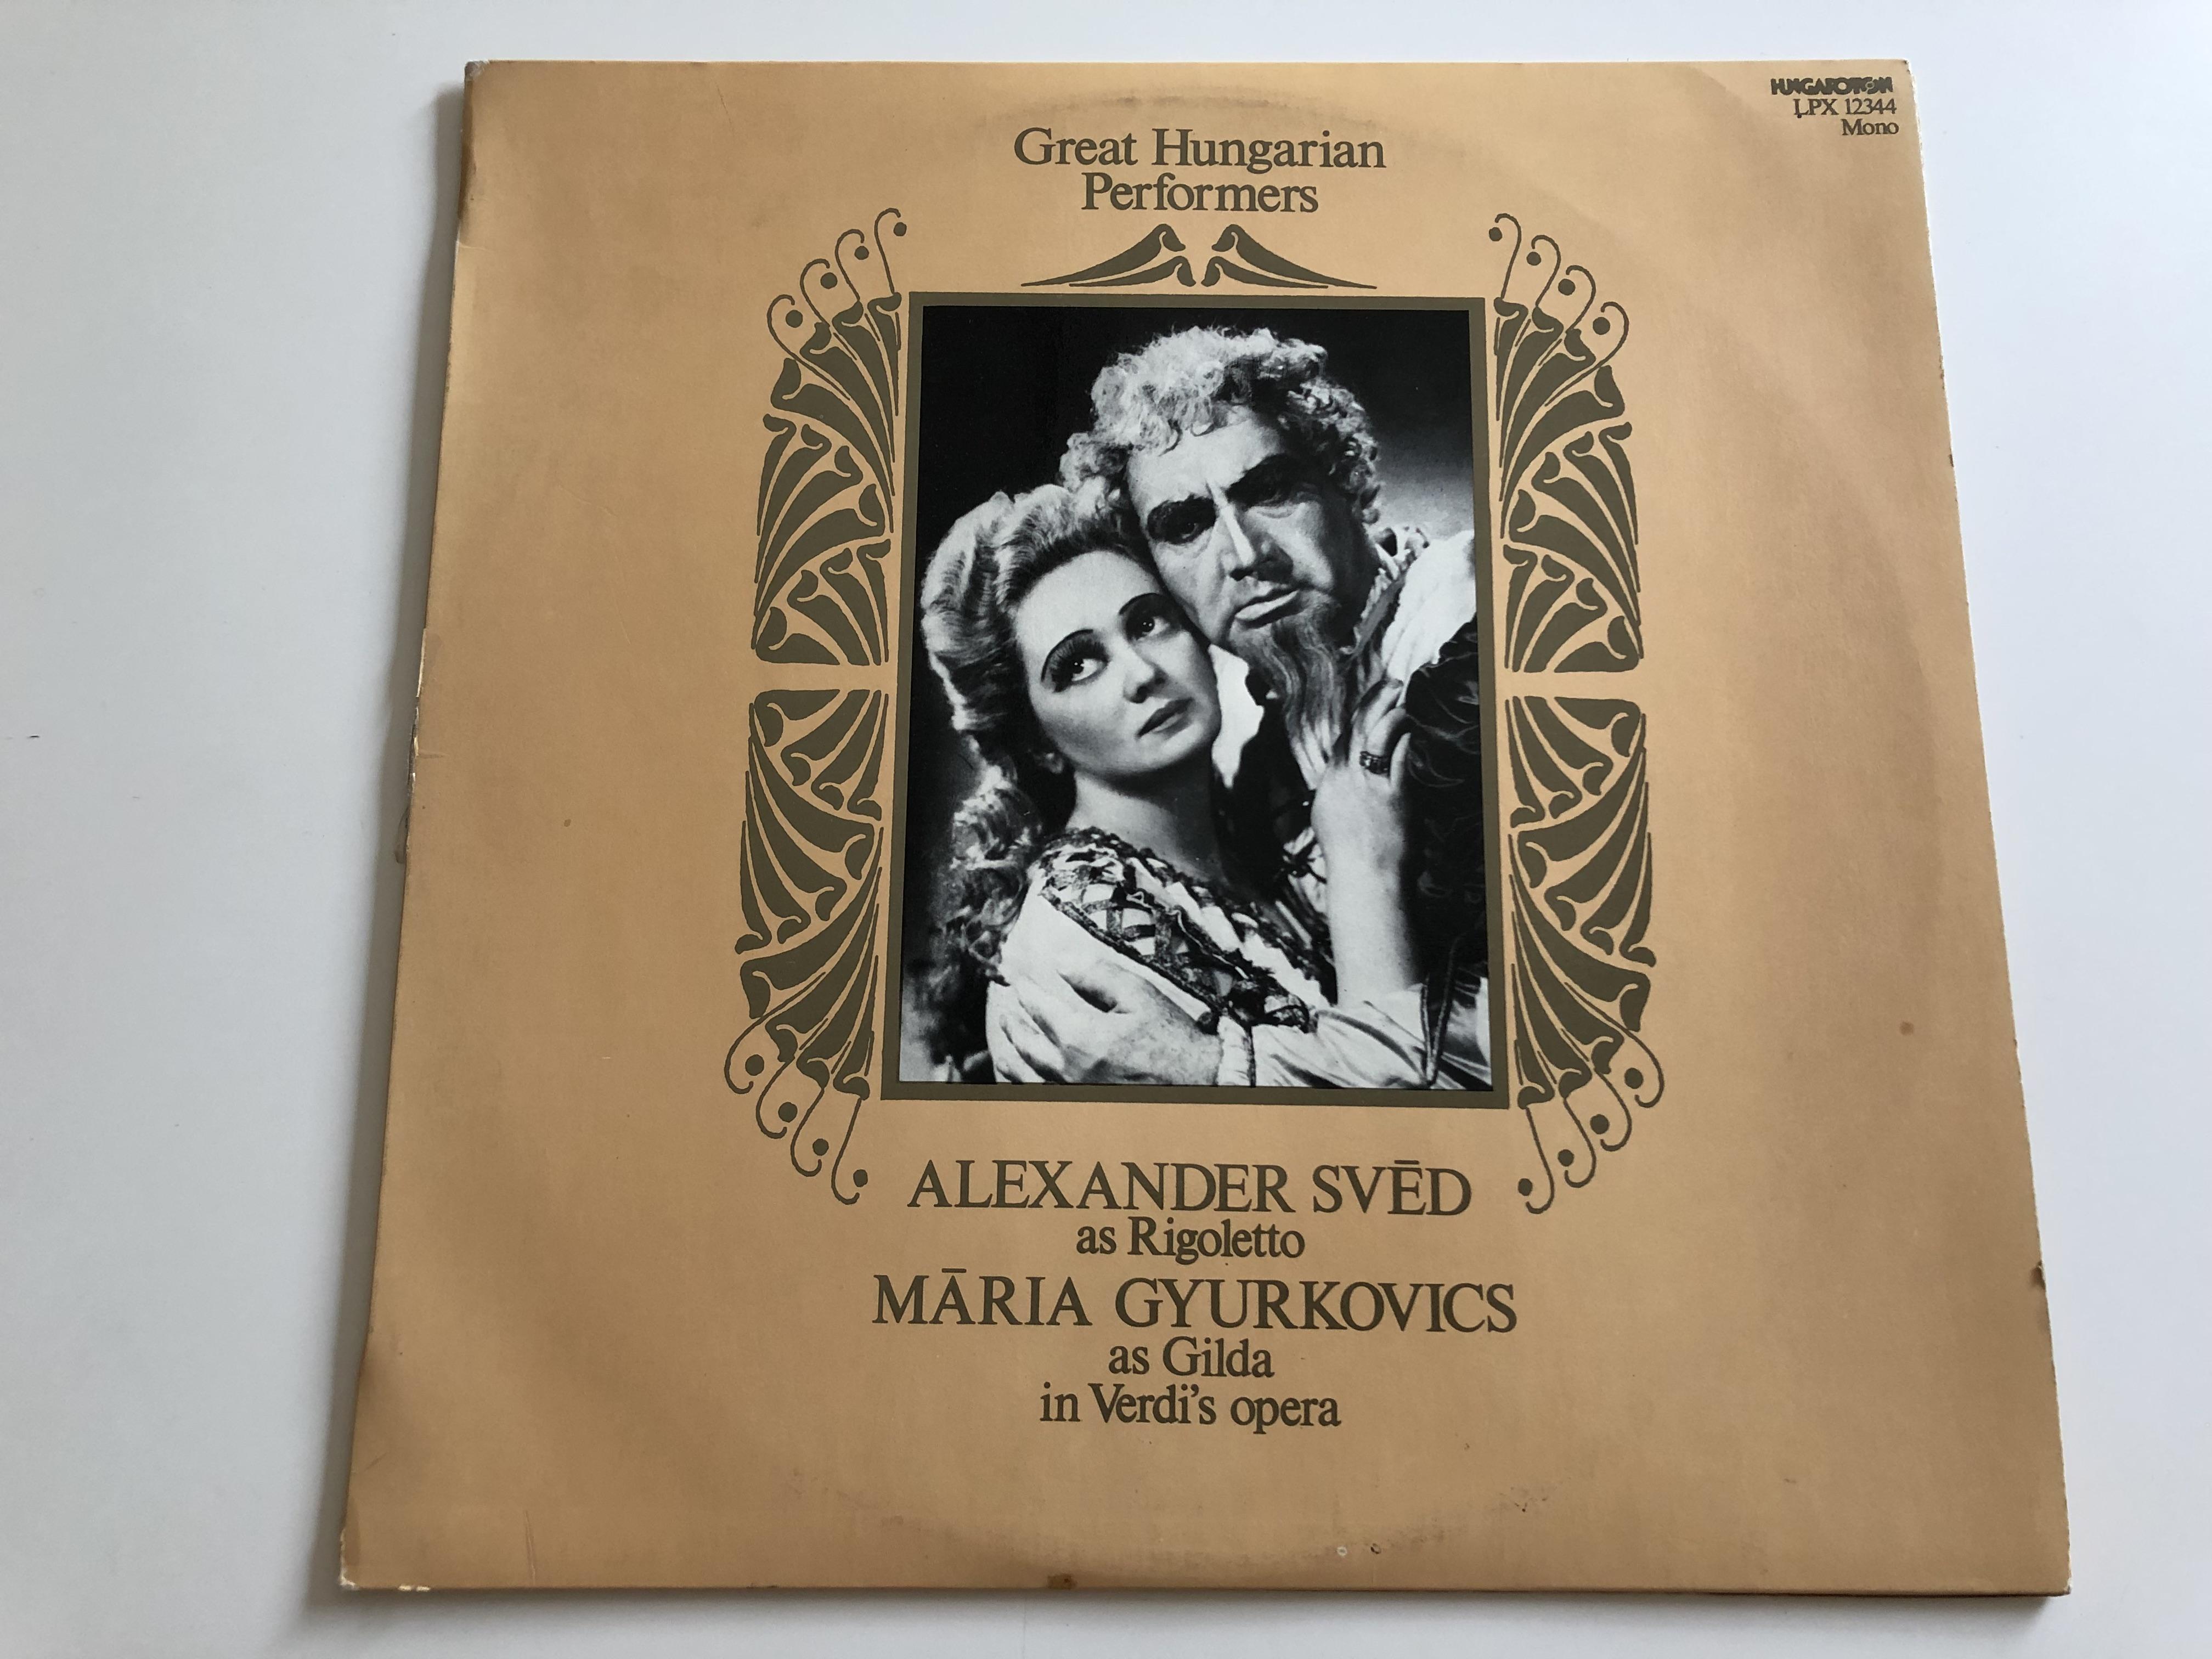 alexander-sv-d-as-as-rigoletto-m-ria-gyurkovics-as-gilda-in-verdi-s-opera-great-hungarian-performers-hungaroton-lp-mono-lpx-12344-1-.jpg